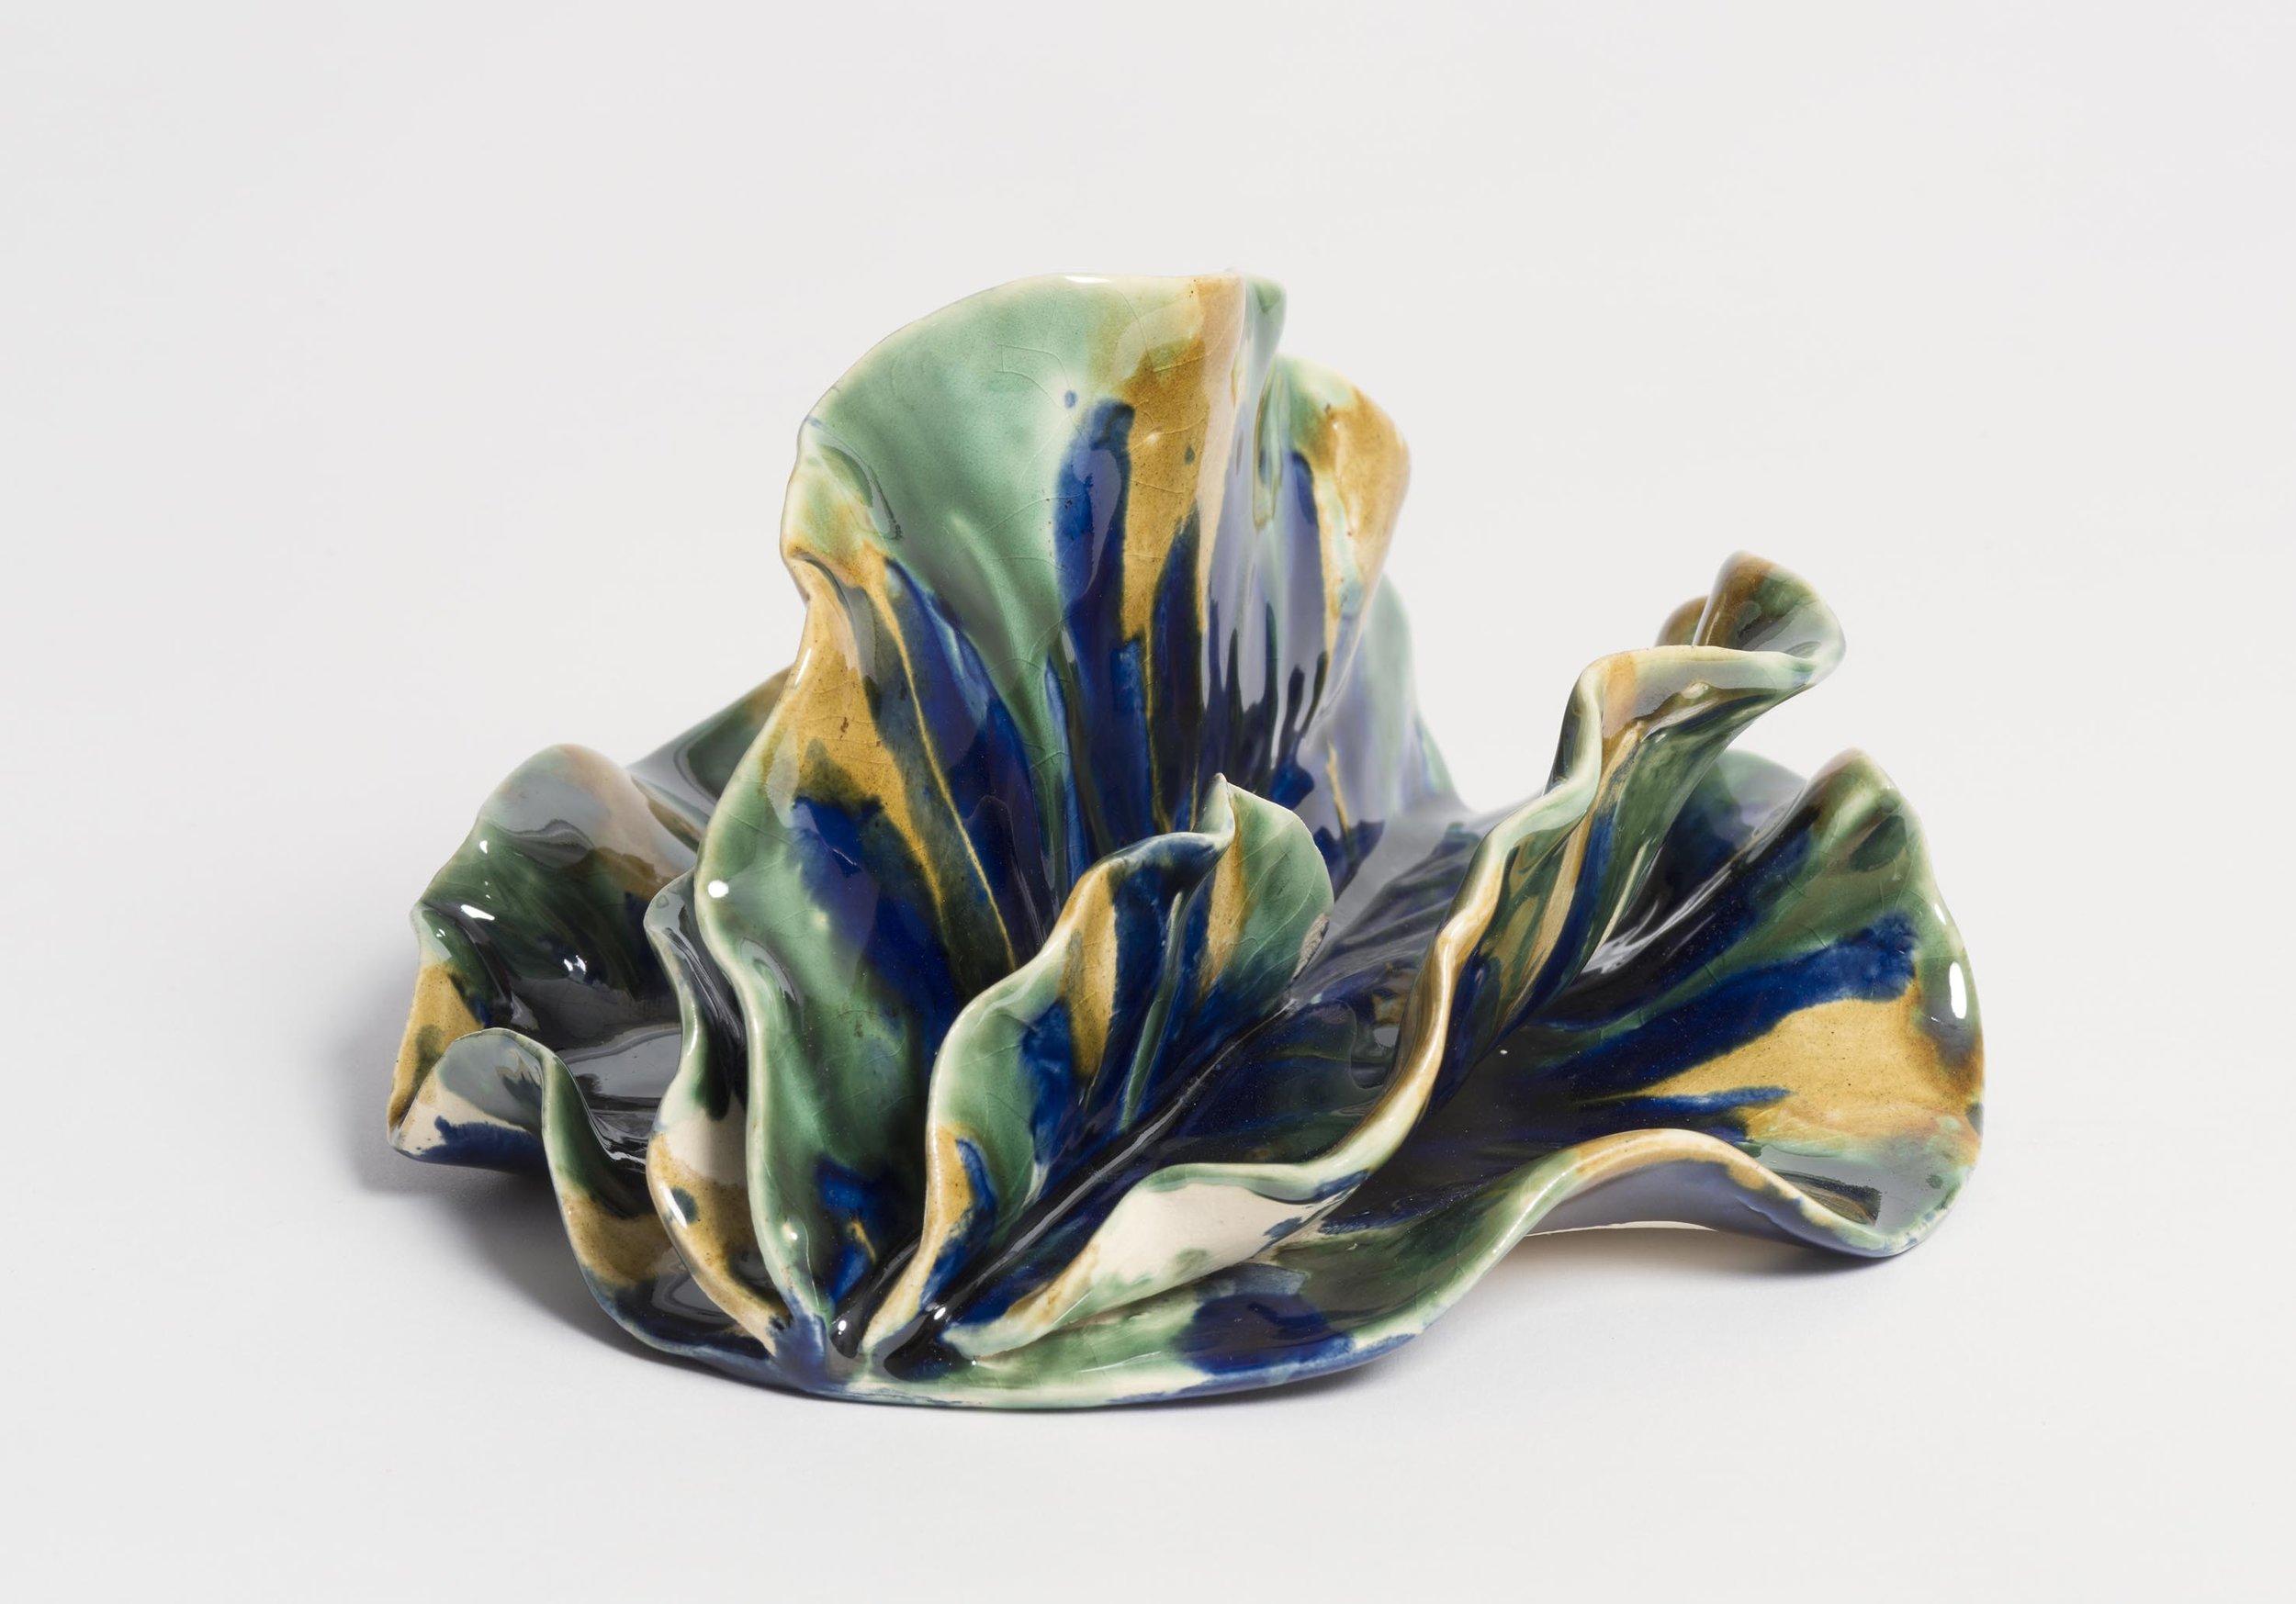 Shiny, frilly thing.  2017. Earthenware, glazed ceramic 17x15x11 cm.$550